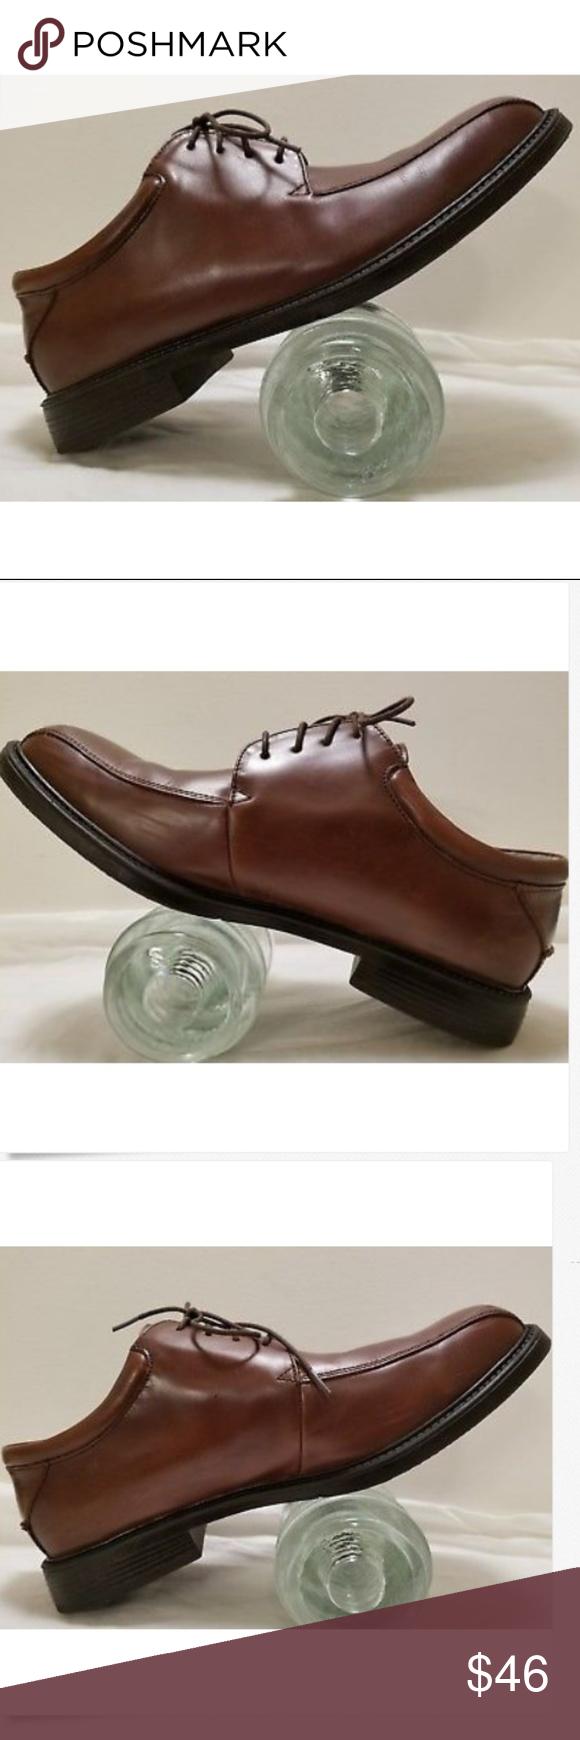 Nunn bush oxford shoes marcell size medium oxfords brown